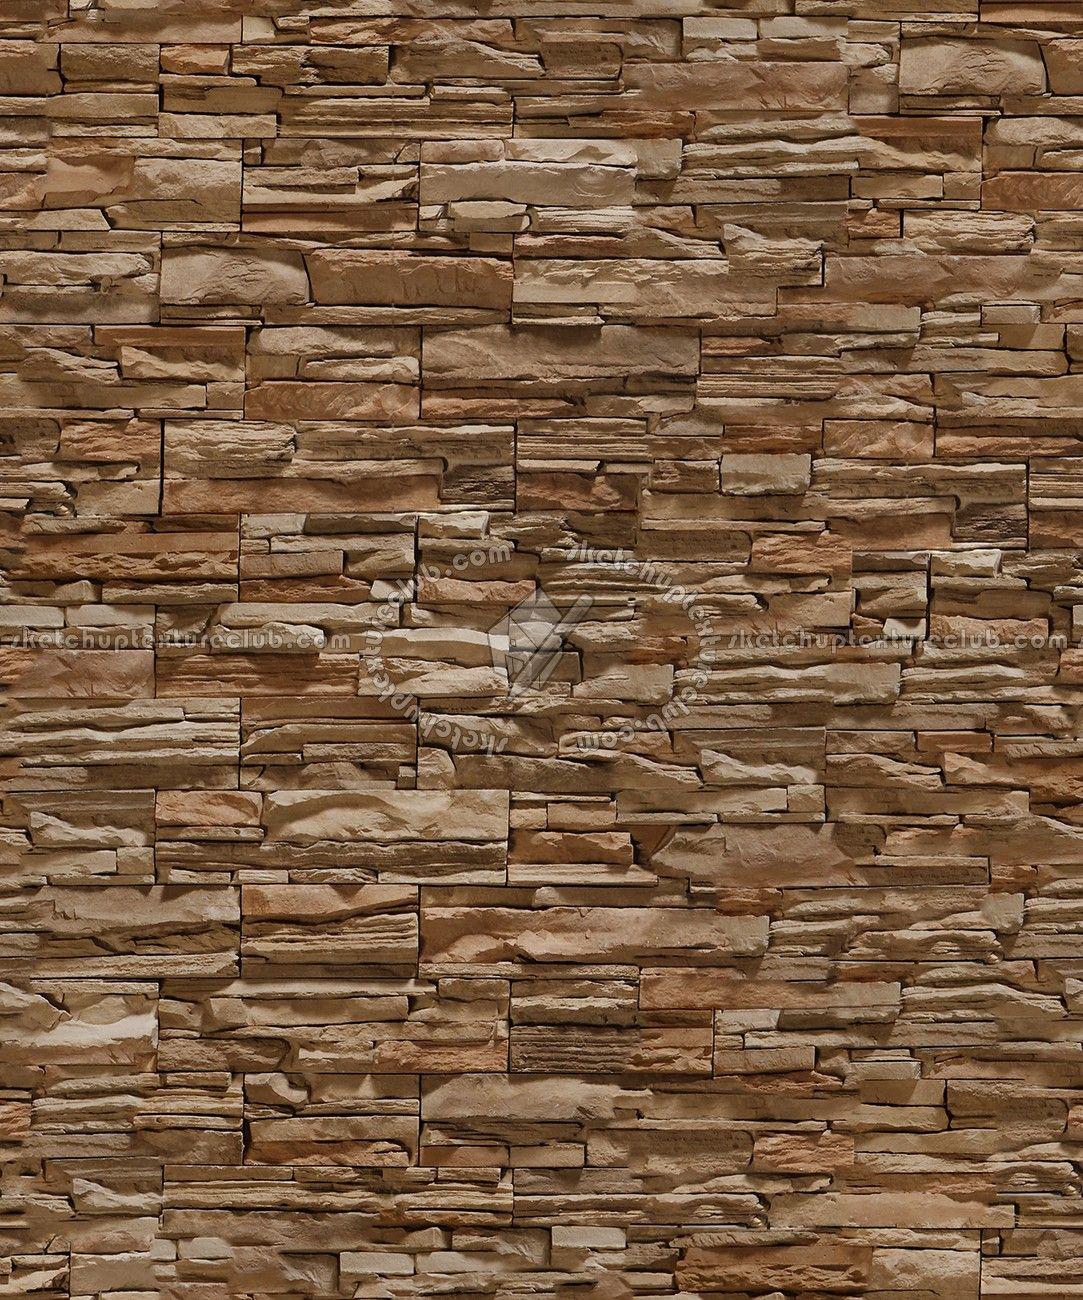 Stacked Slabs Walls Stone Texture Seamless 08175 Stone Texture